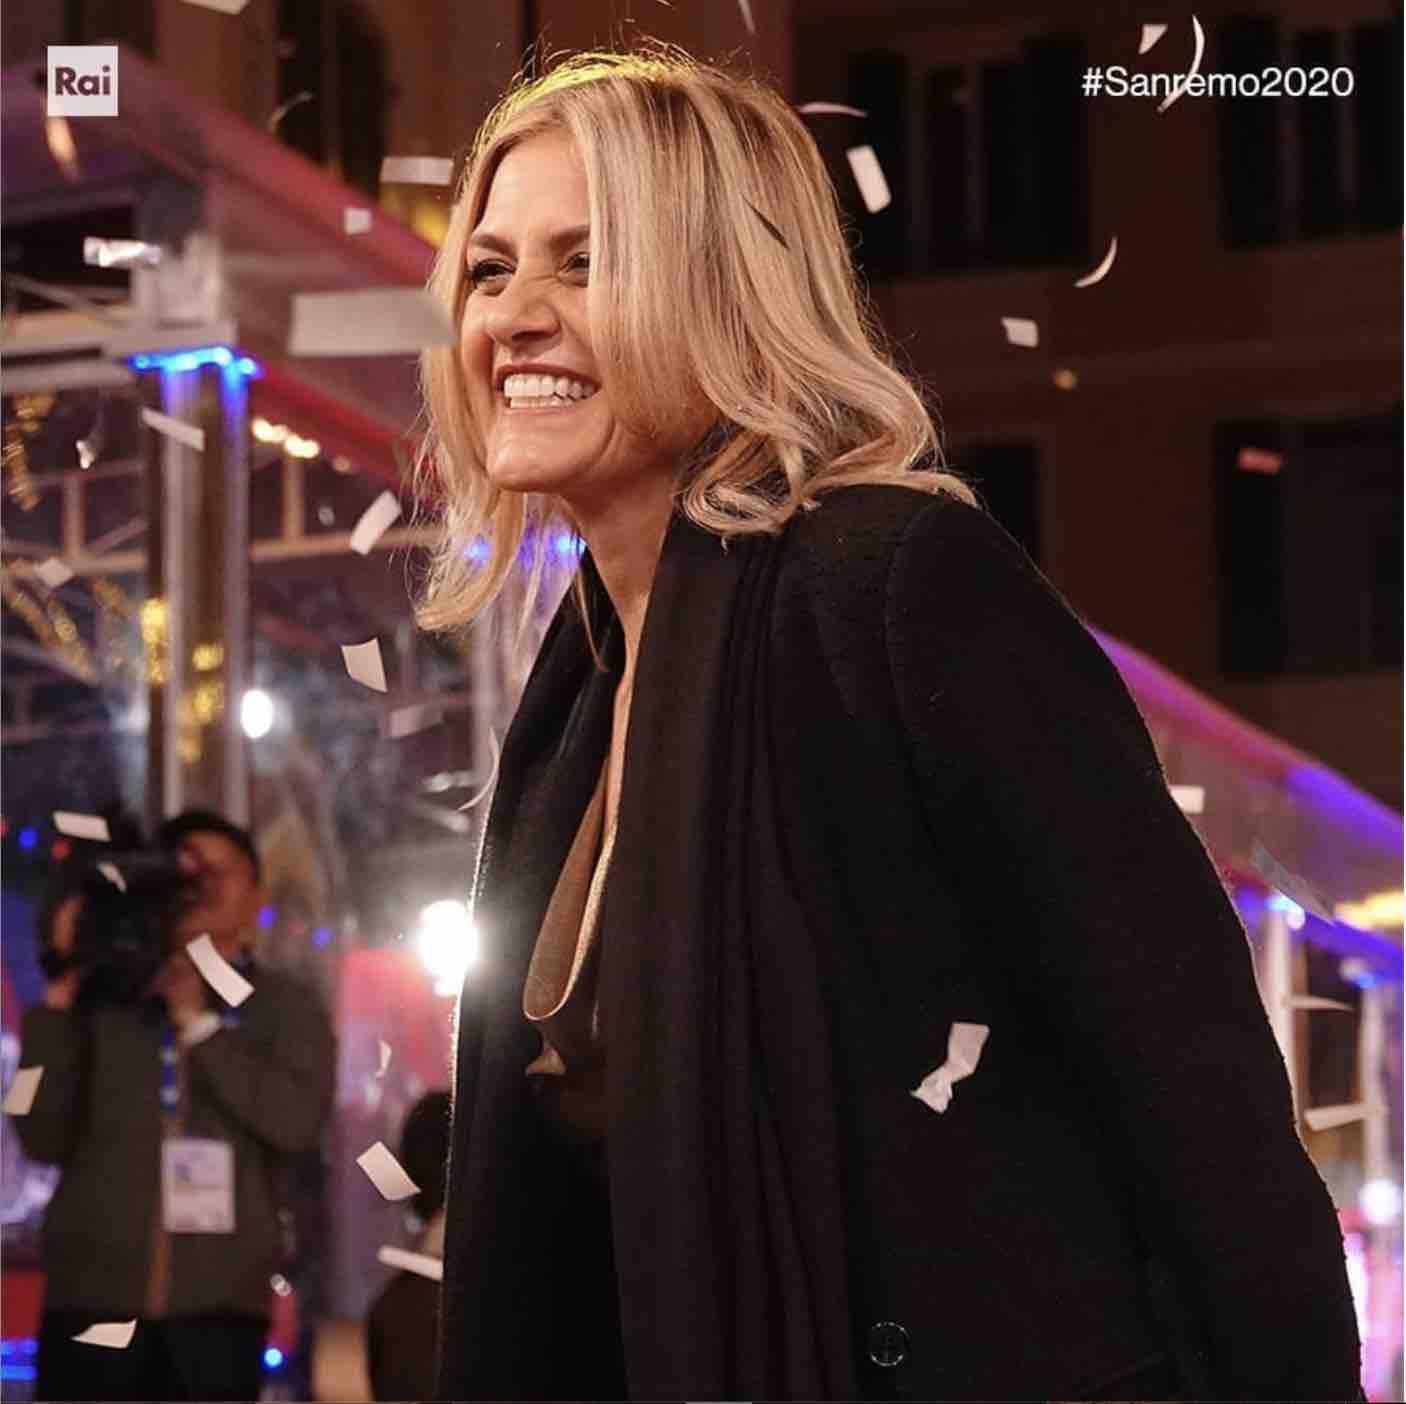 Irene Grandi Sanremo 2020